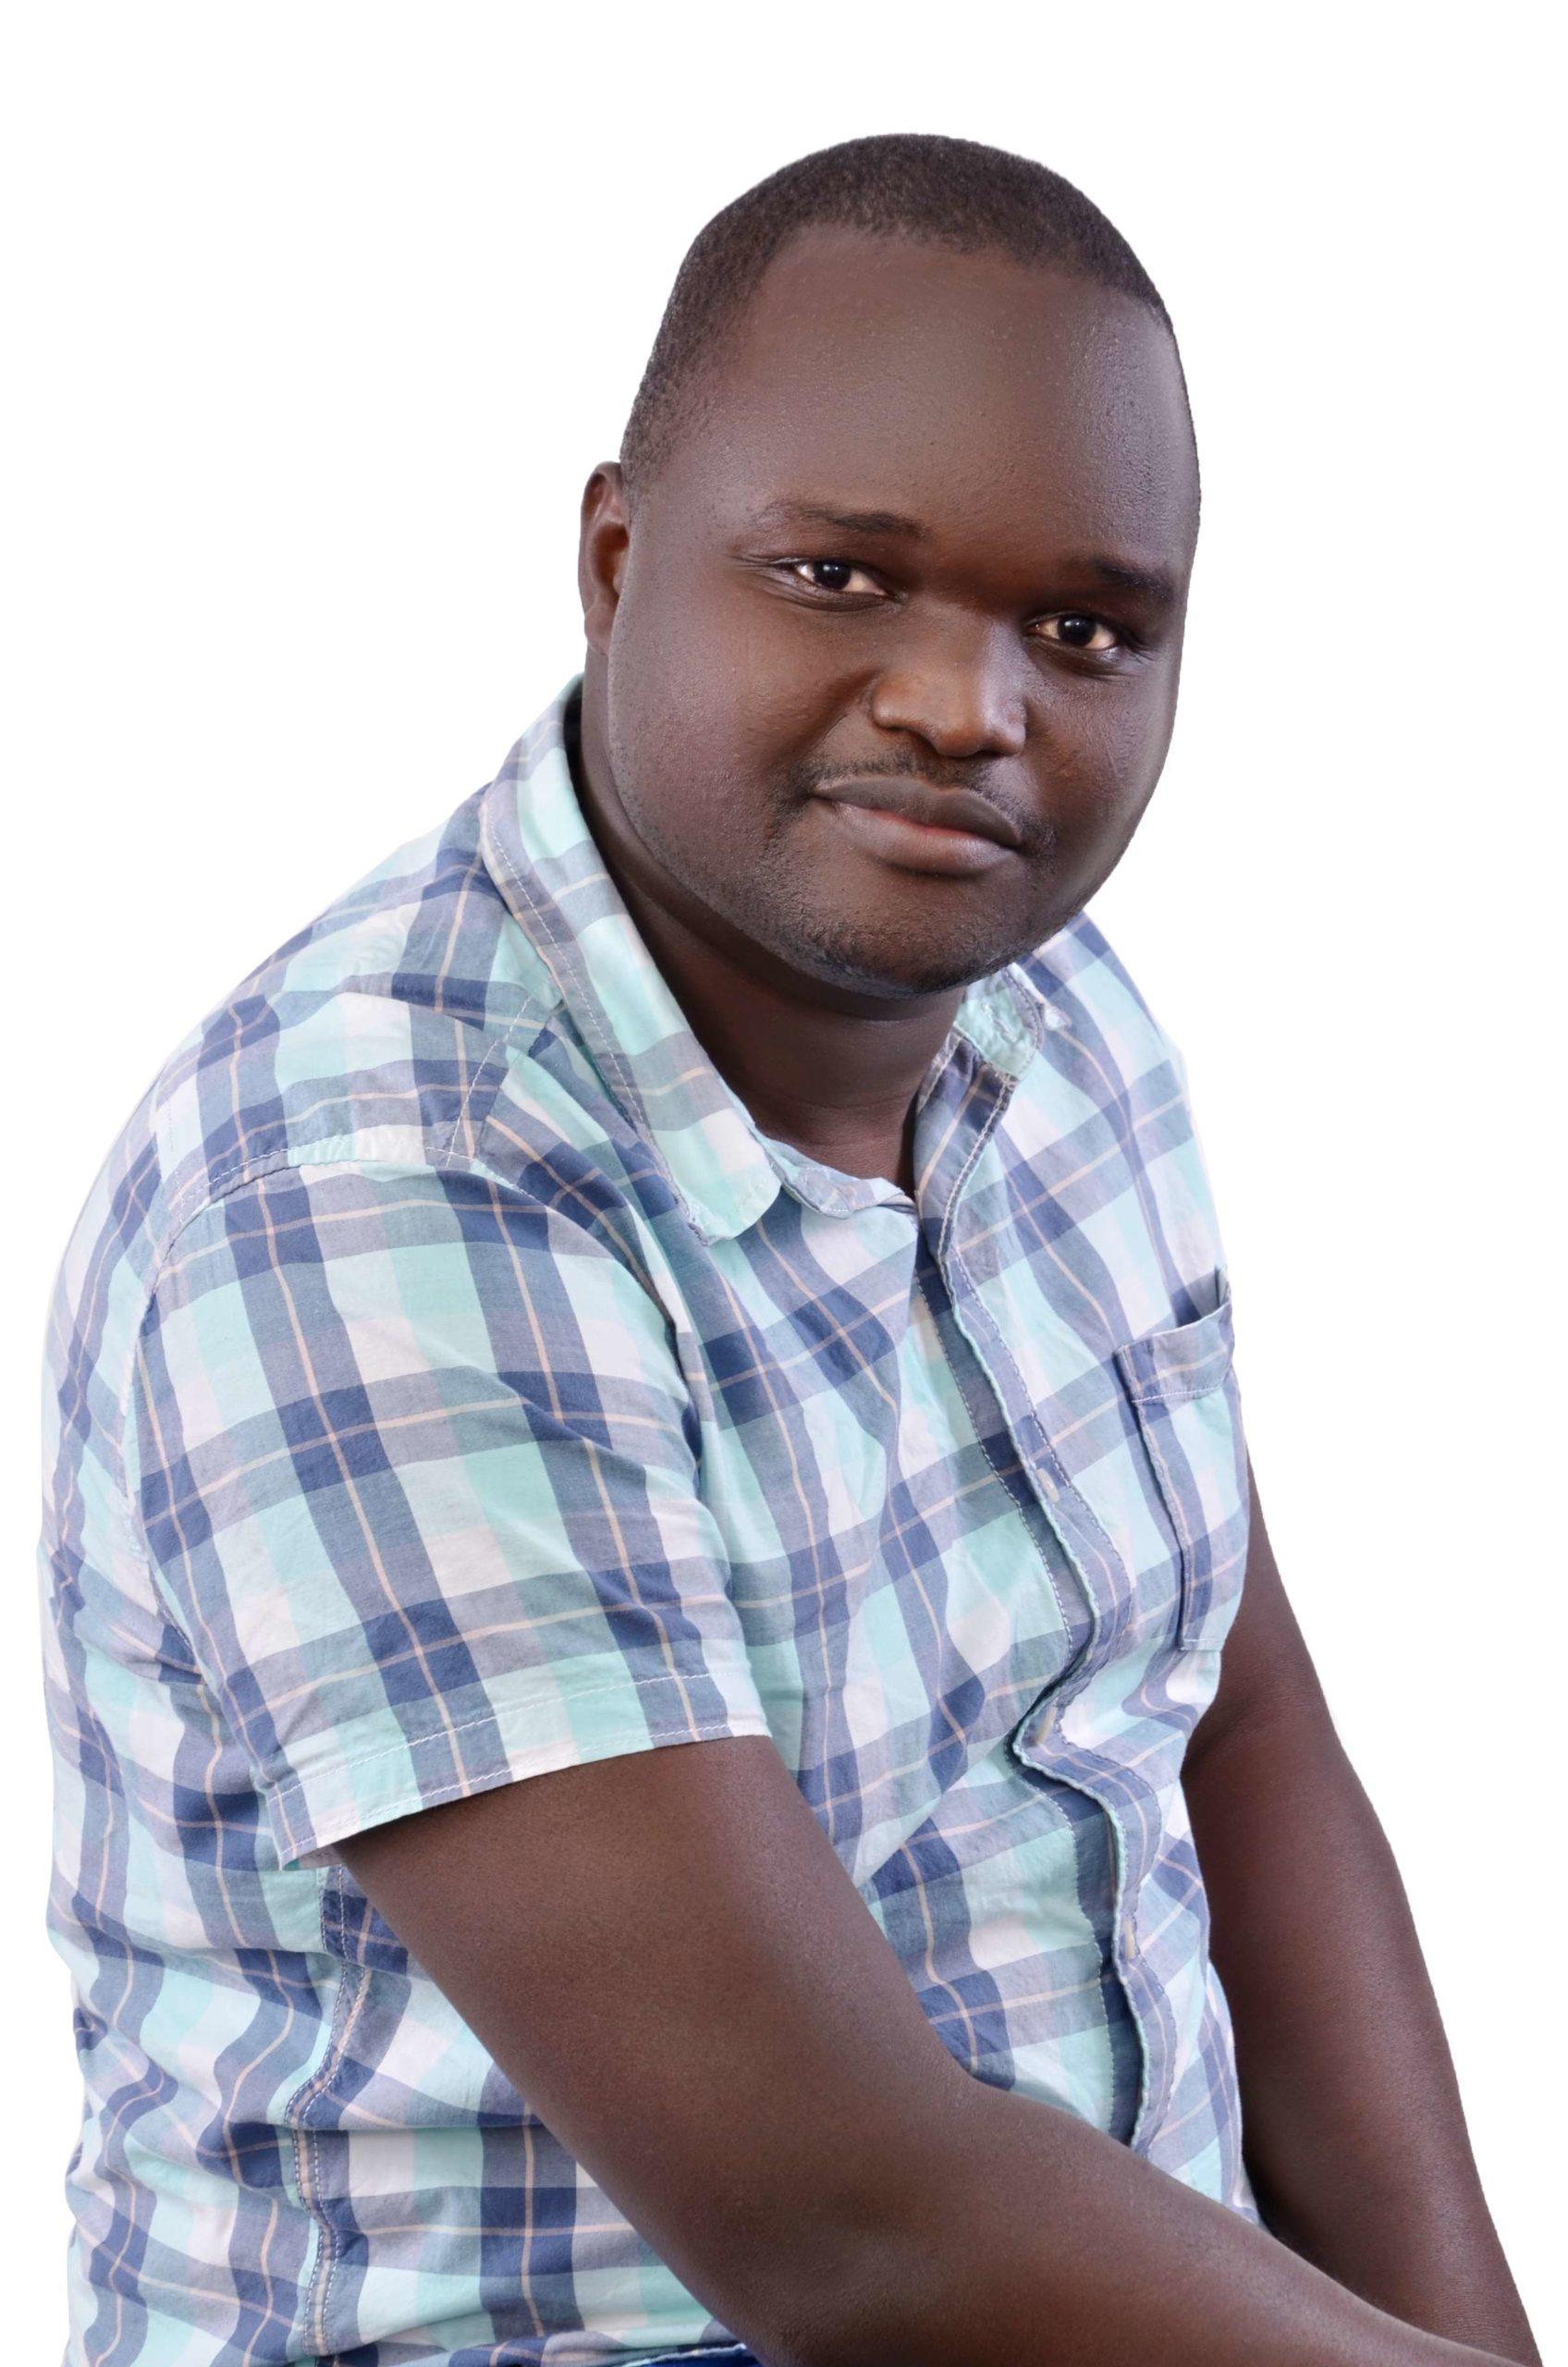 Leiney Ogeto